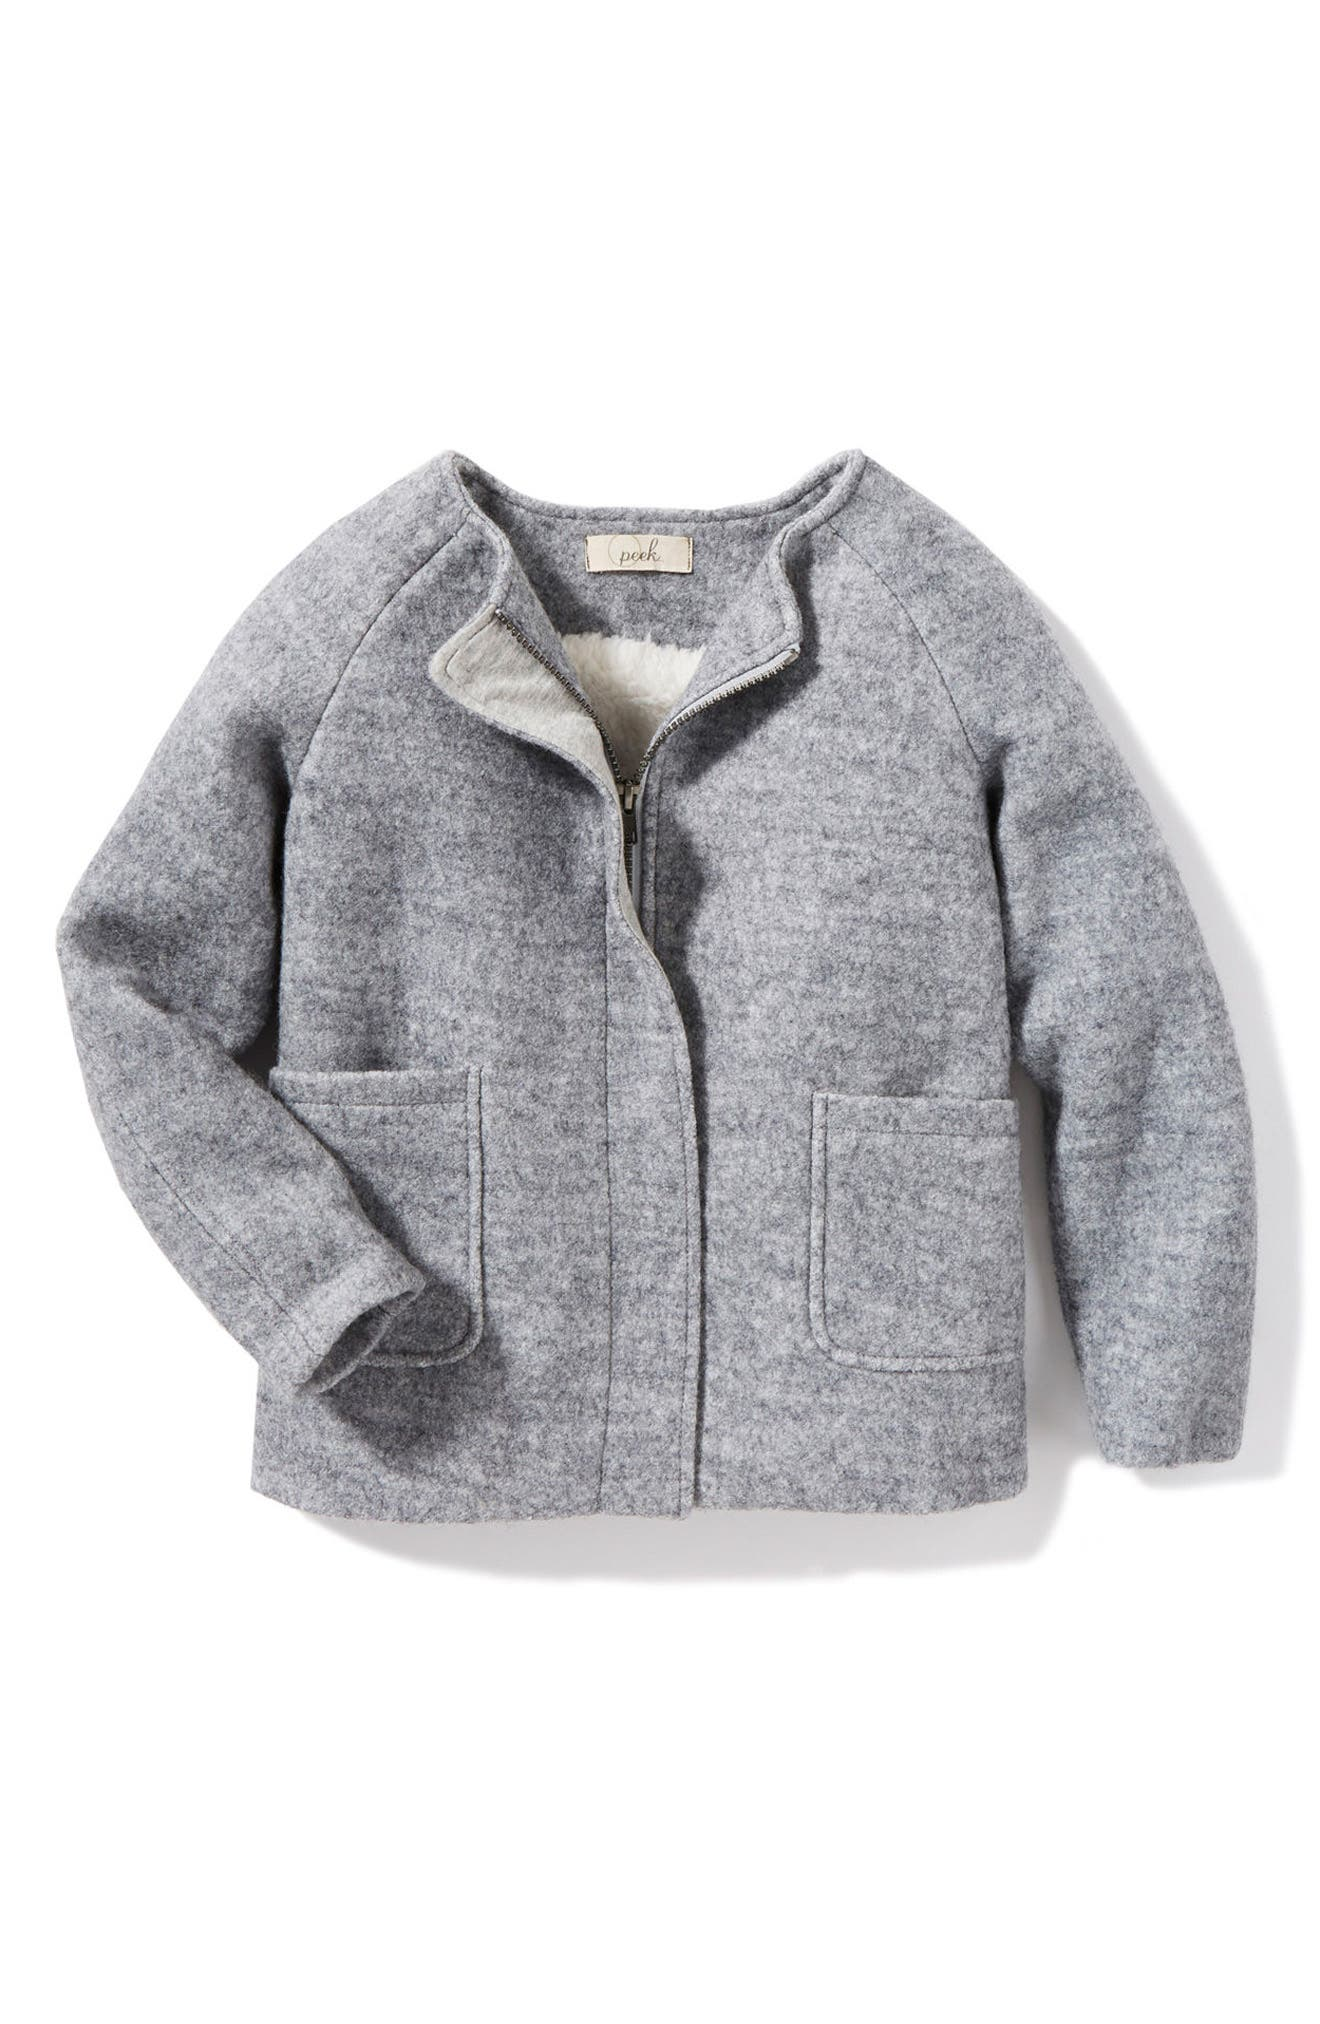 Glenda Fleece Jacket,                             Main thumbnail 1, color,                             Grey Heather